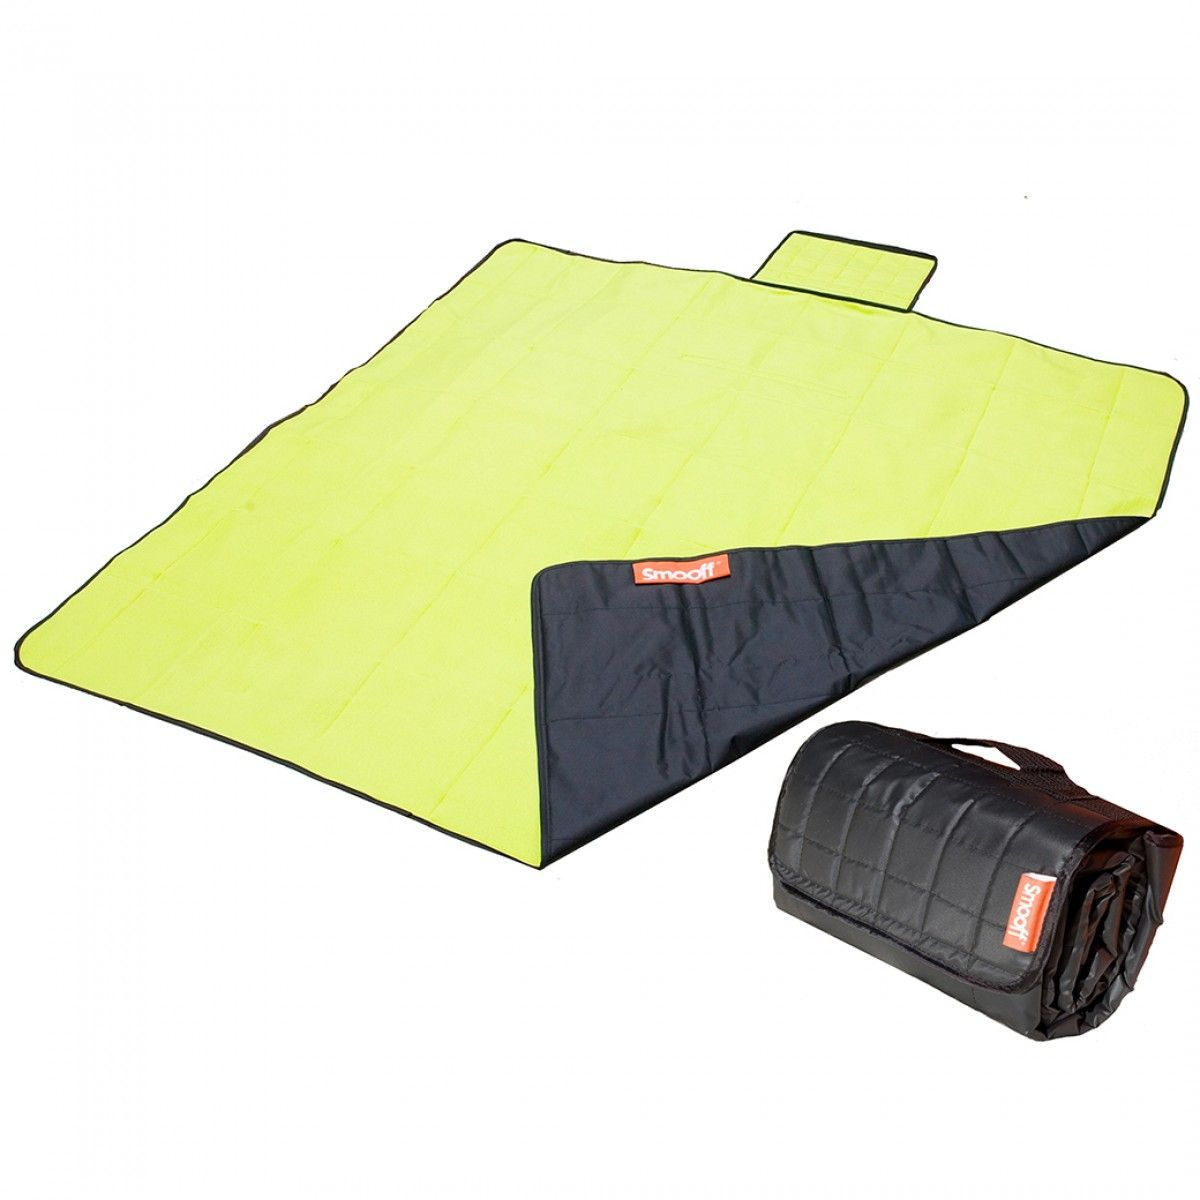 Smooff Black/Lime Picnic Blanket / Picknickkleed / Picknickdecke